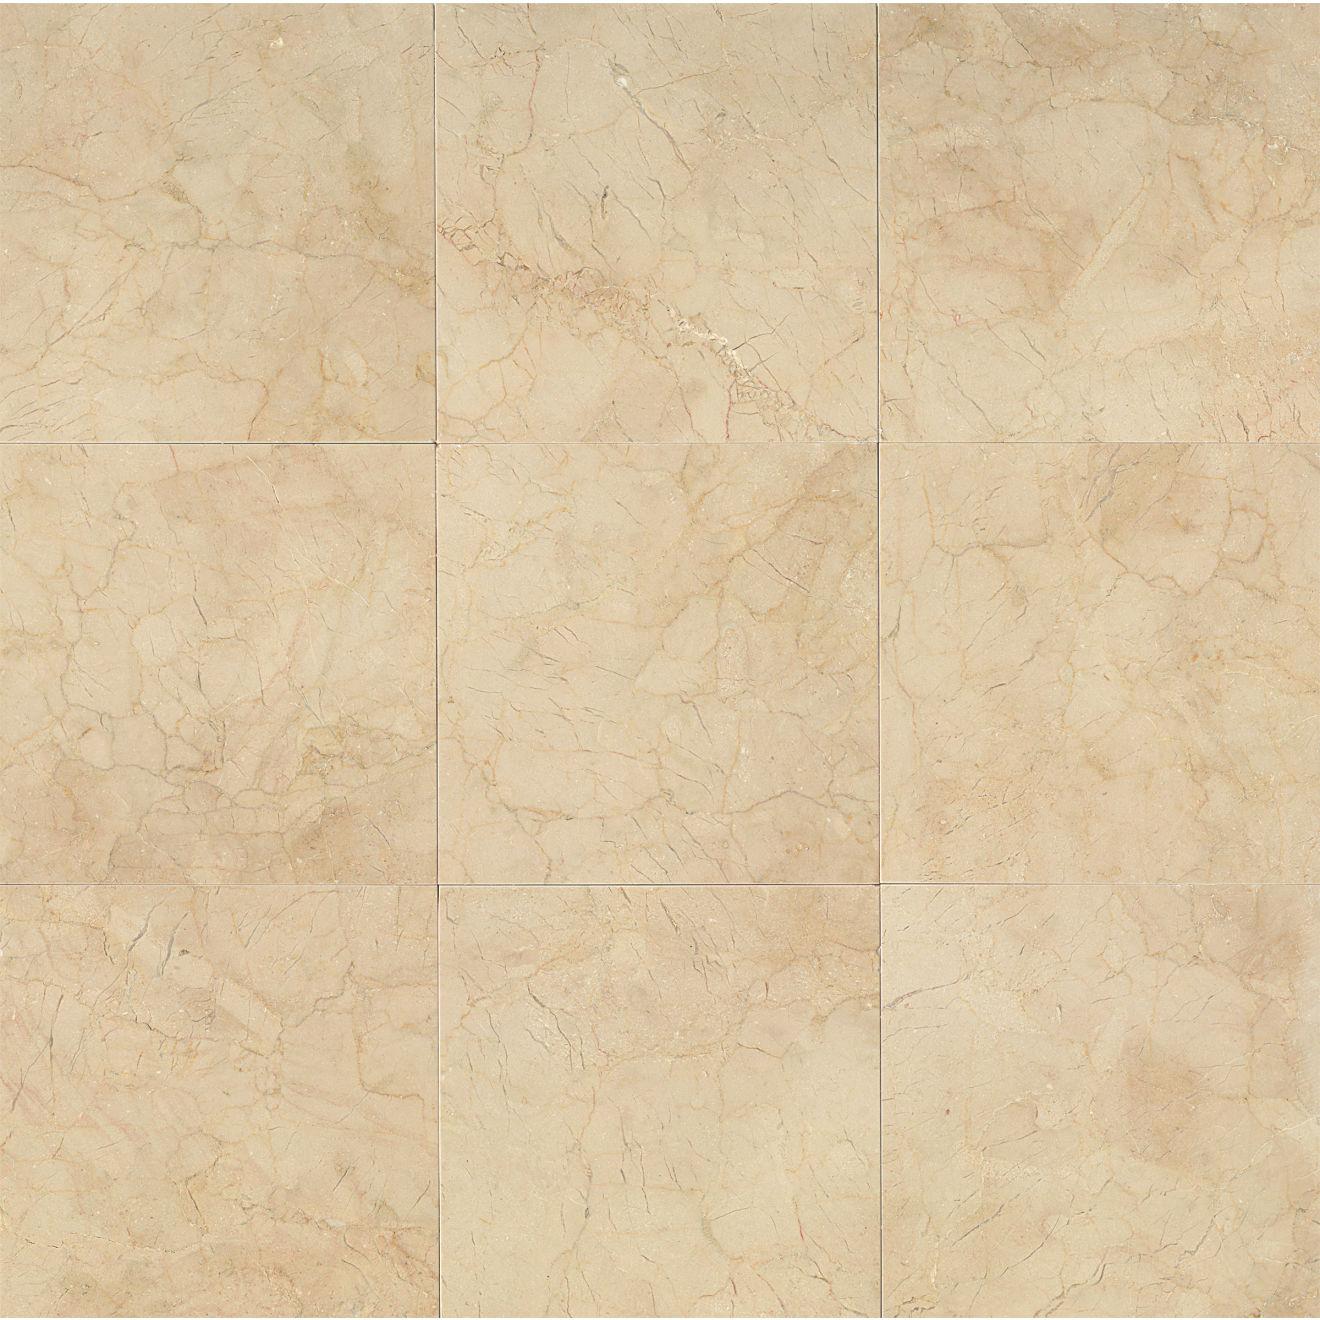 "Crema Marfil Classic 12"" x 12"" Floor & Wall Tile"